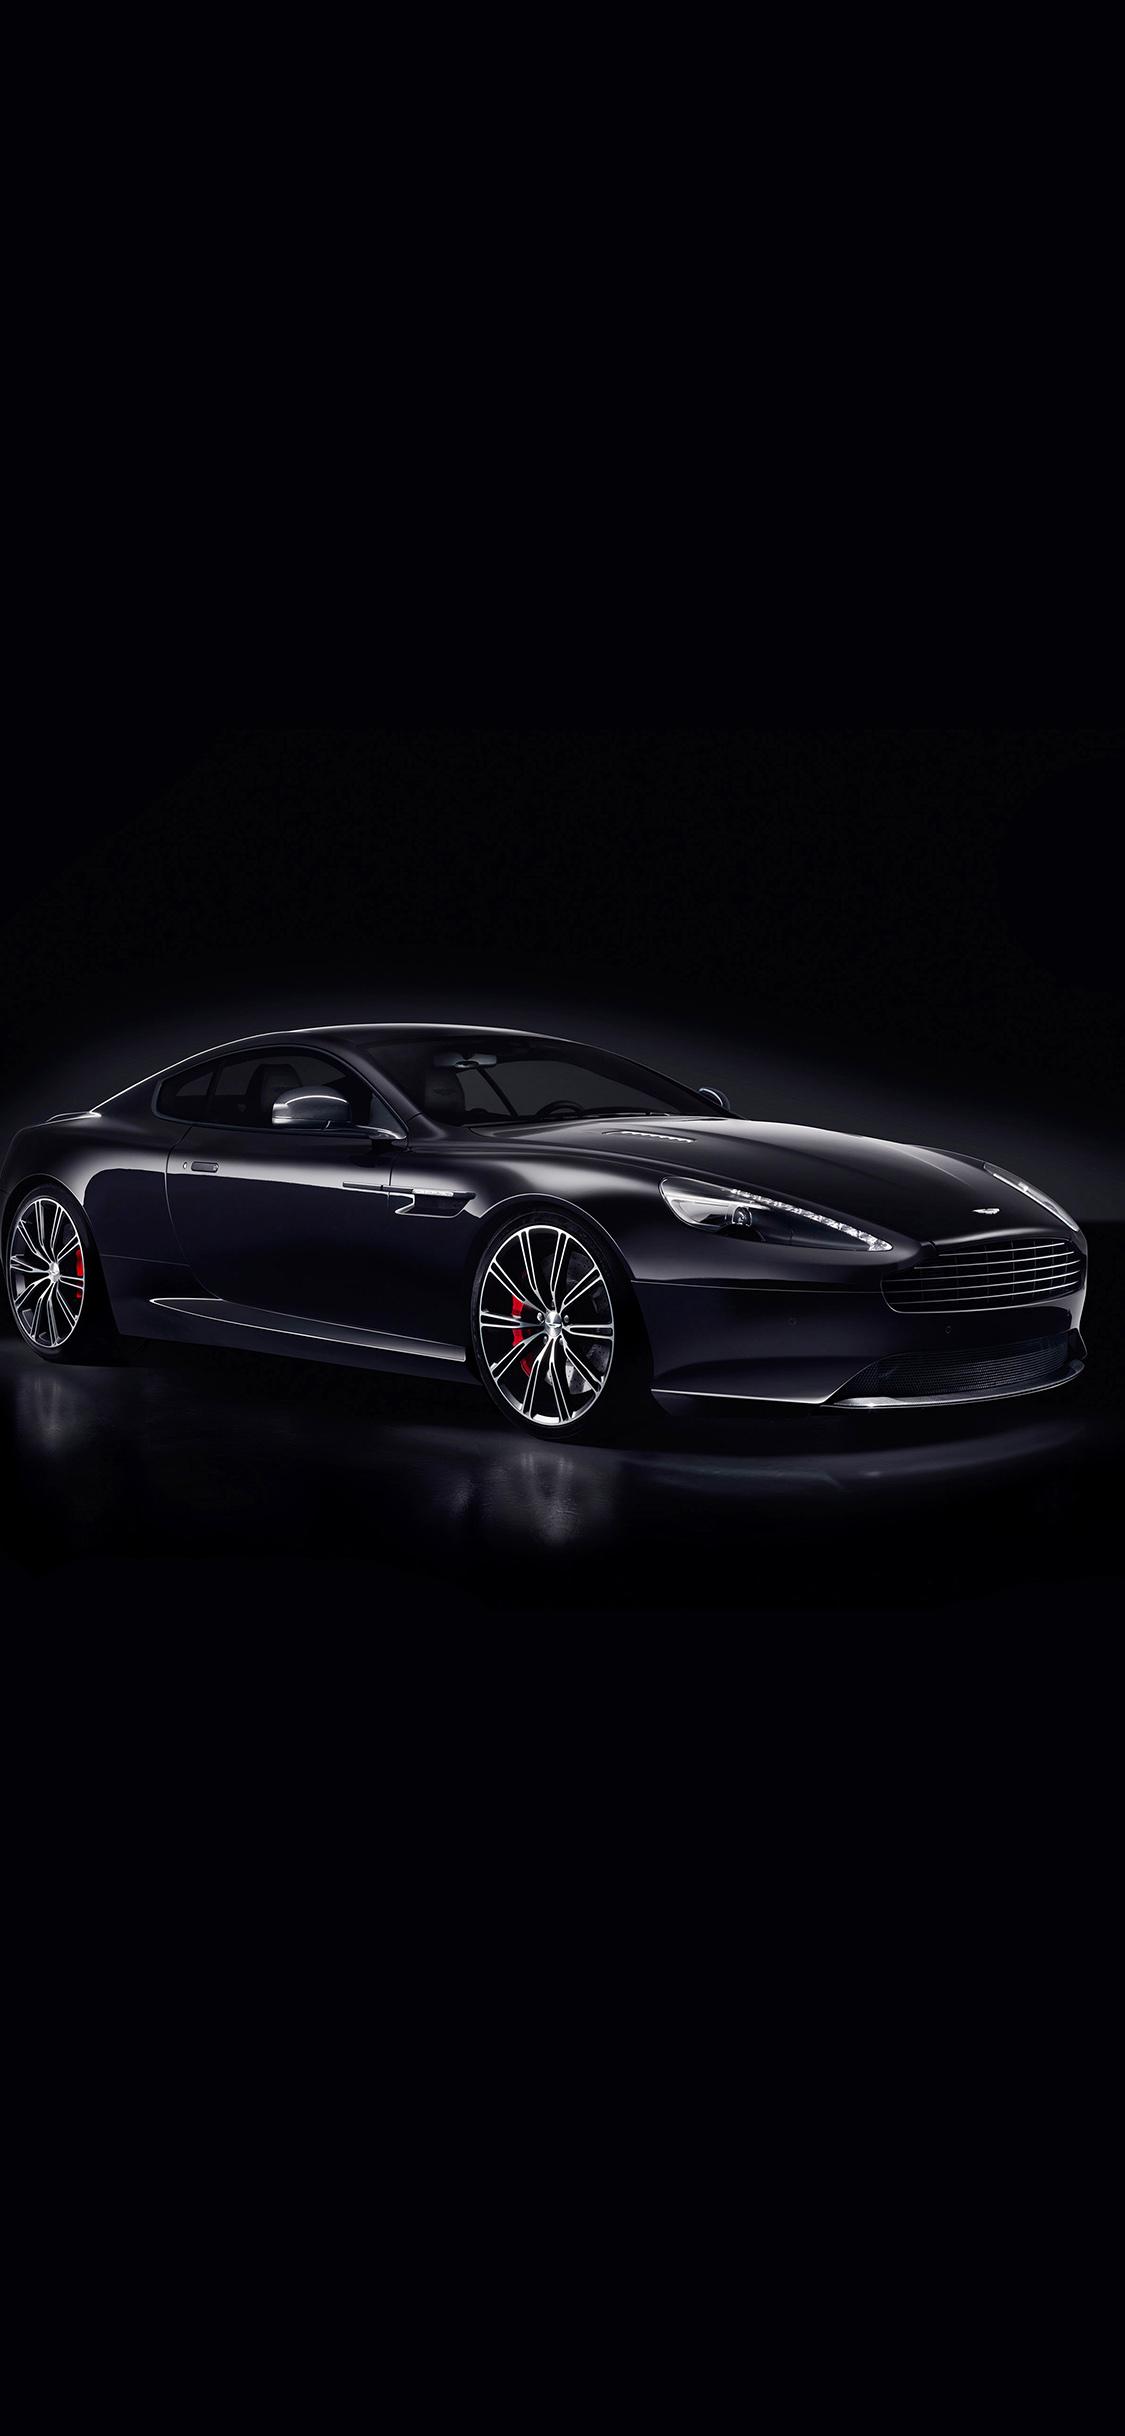 iPhoneXpapers.com-Apple-iPhone-wallpaper-am30-aston-martin-db9-dark-sports-car